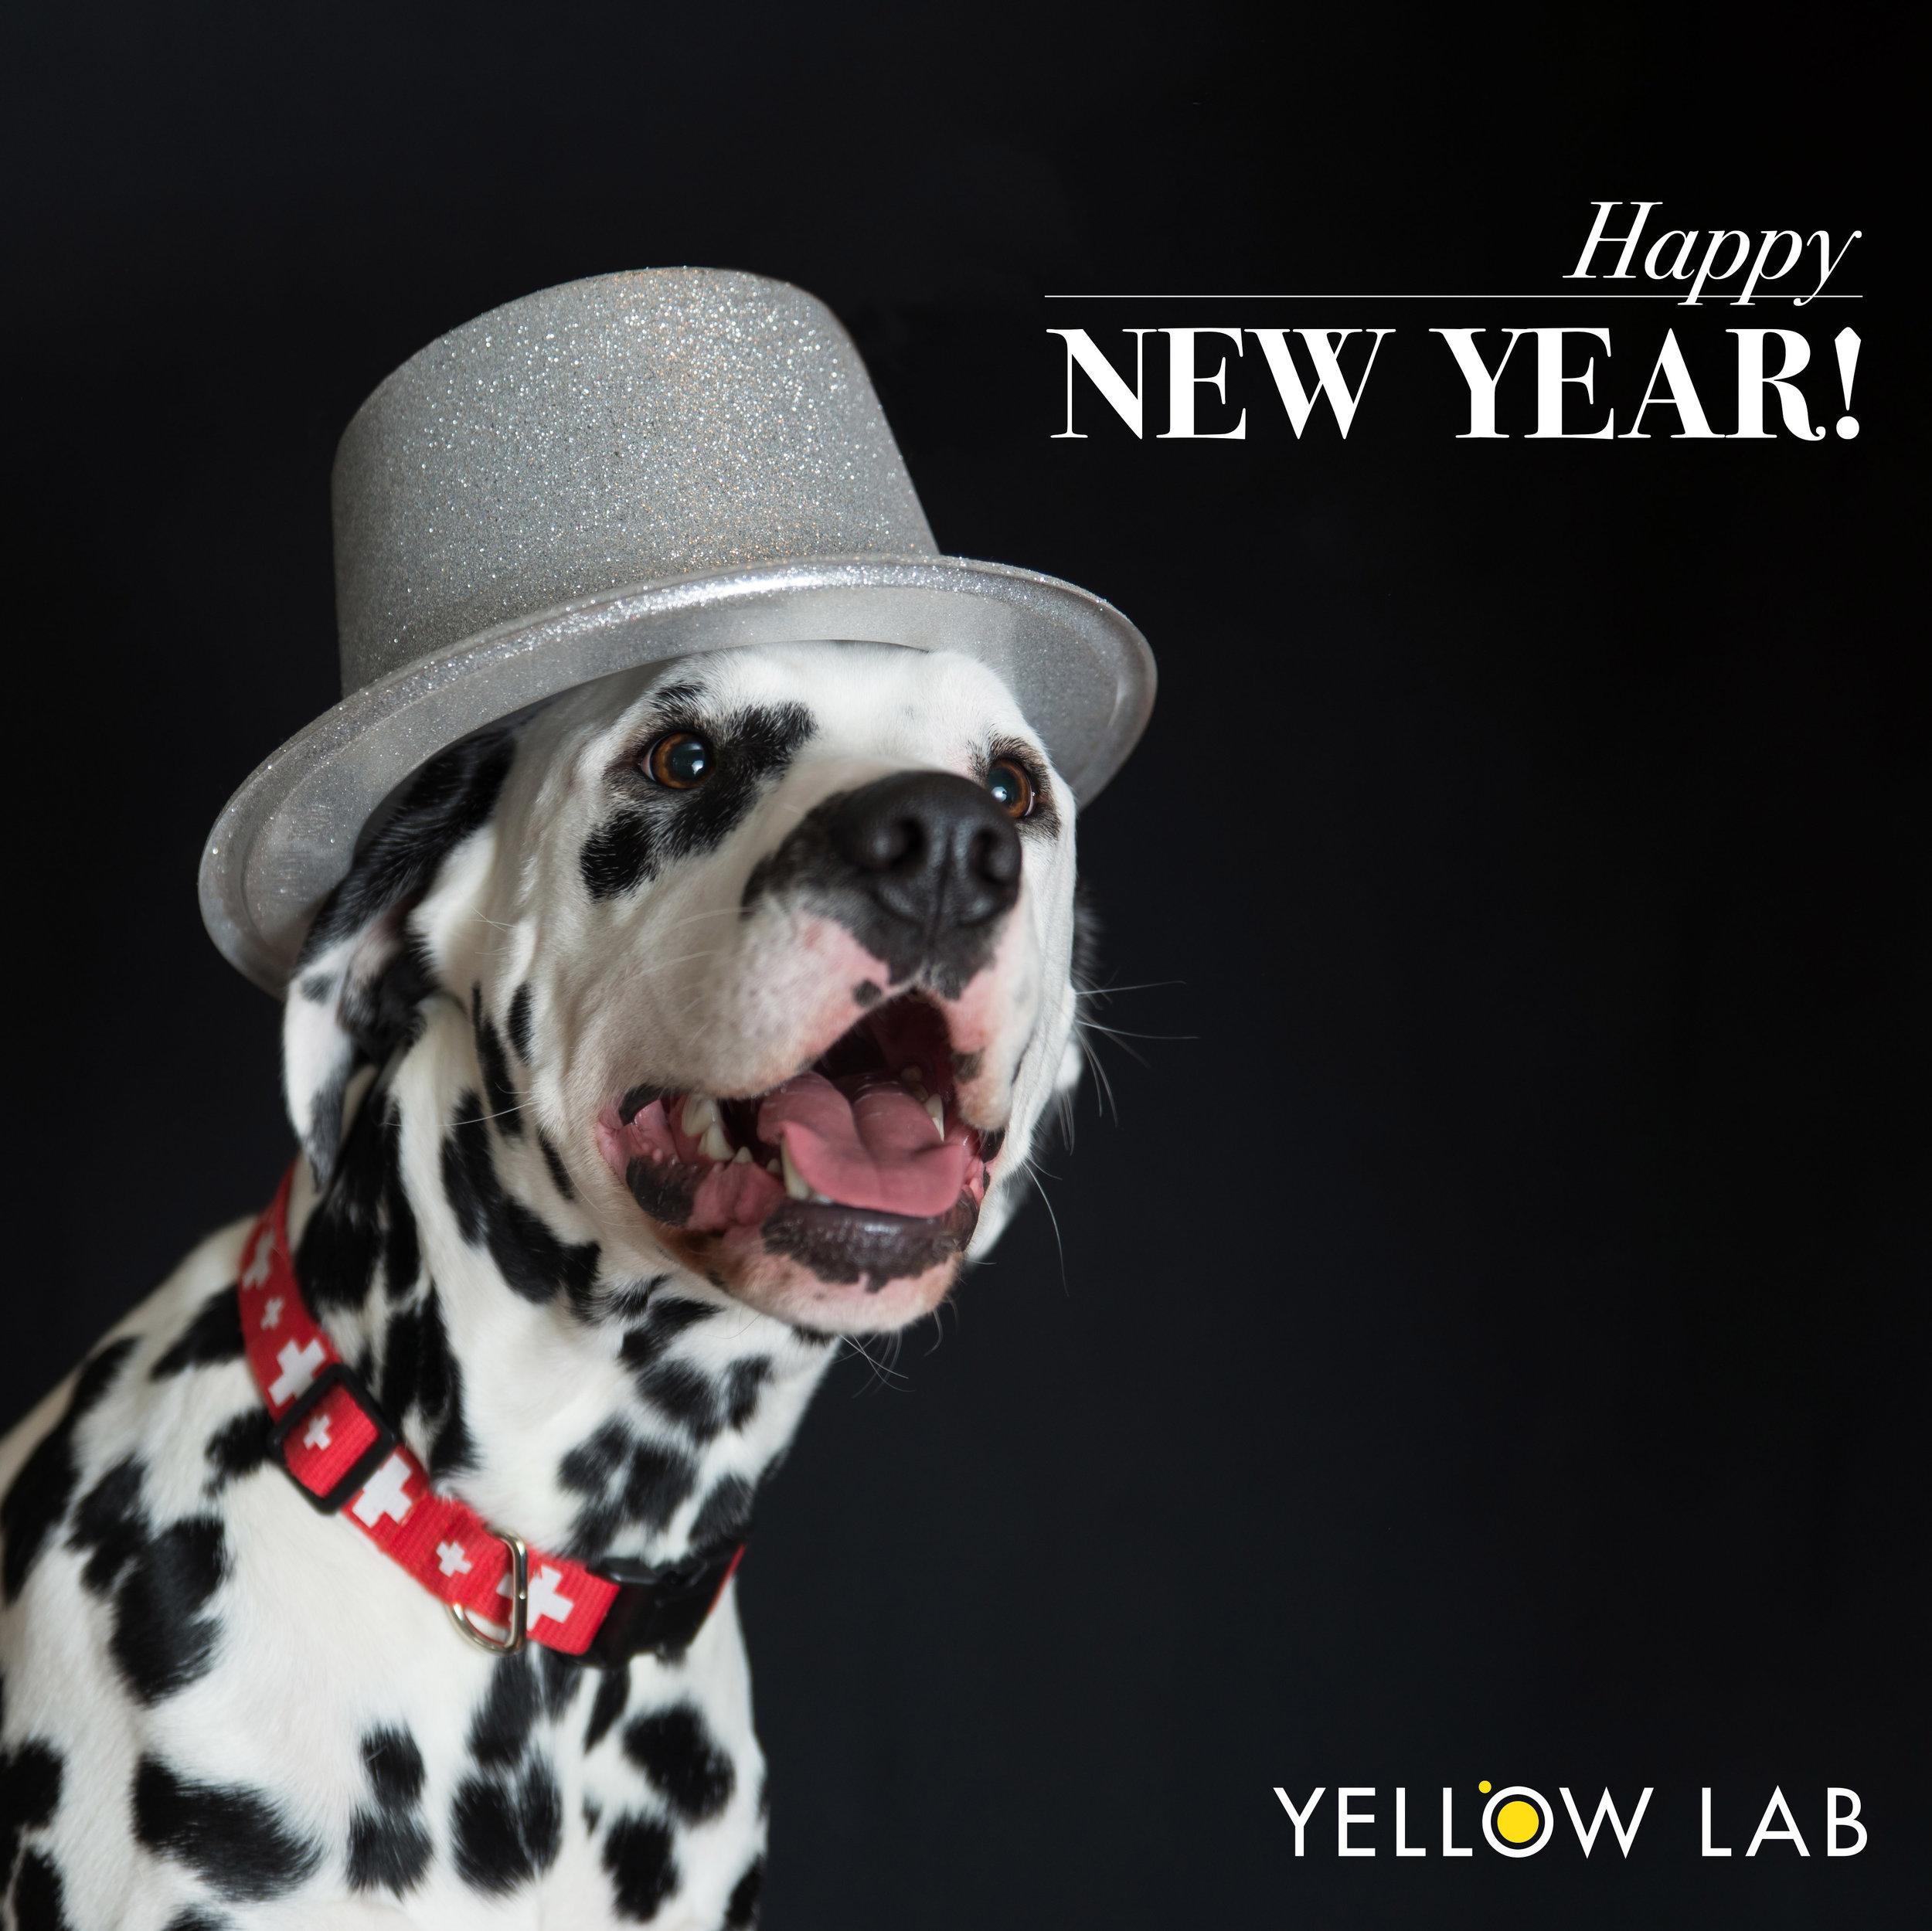 happy new year enzo.jpg